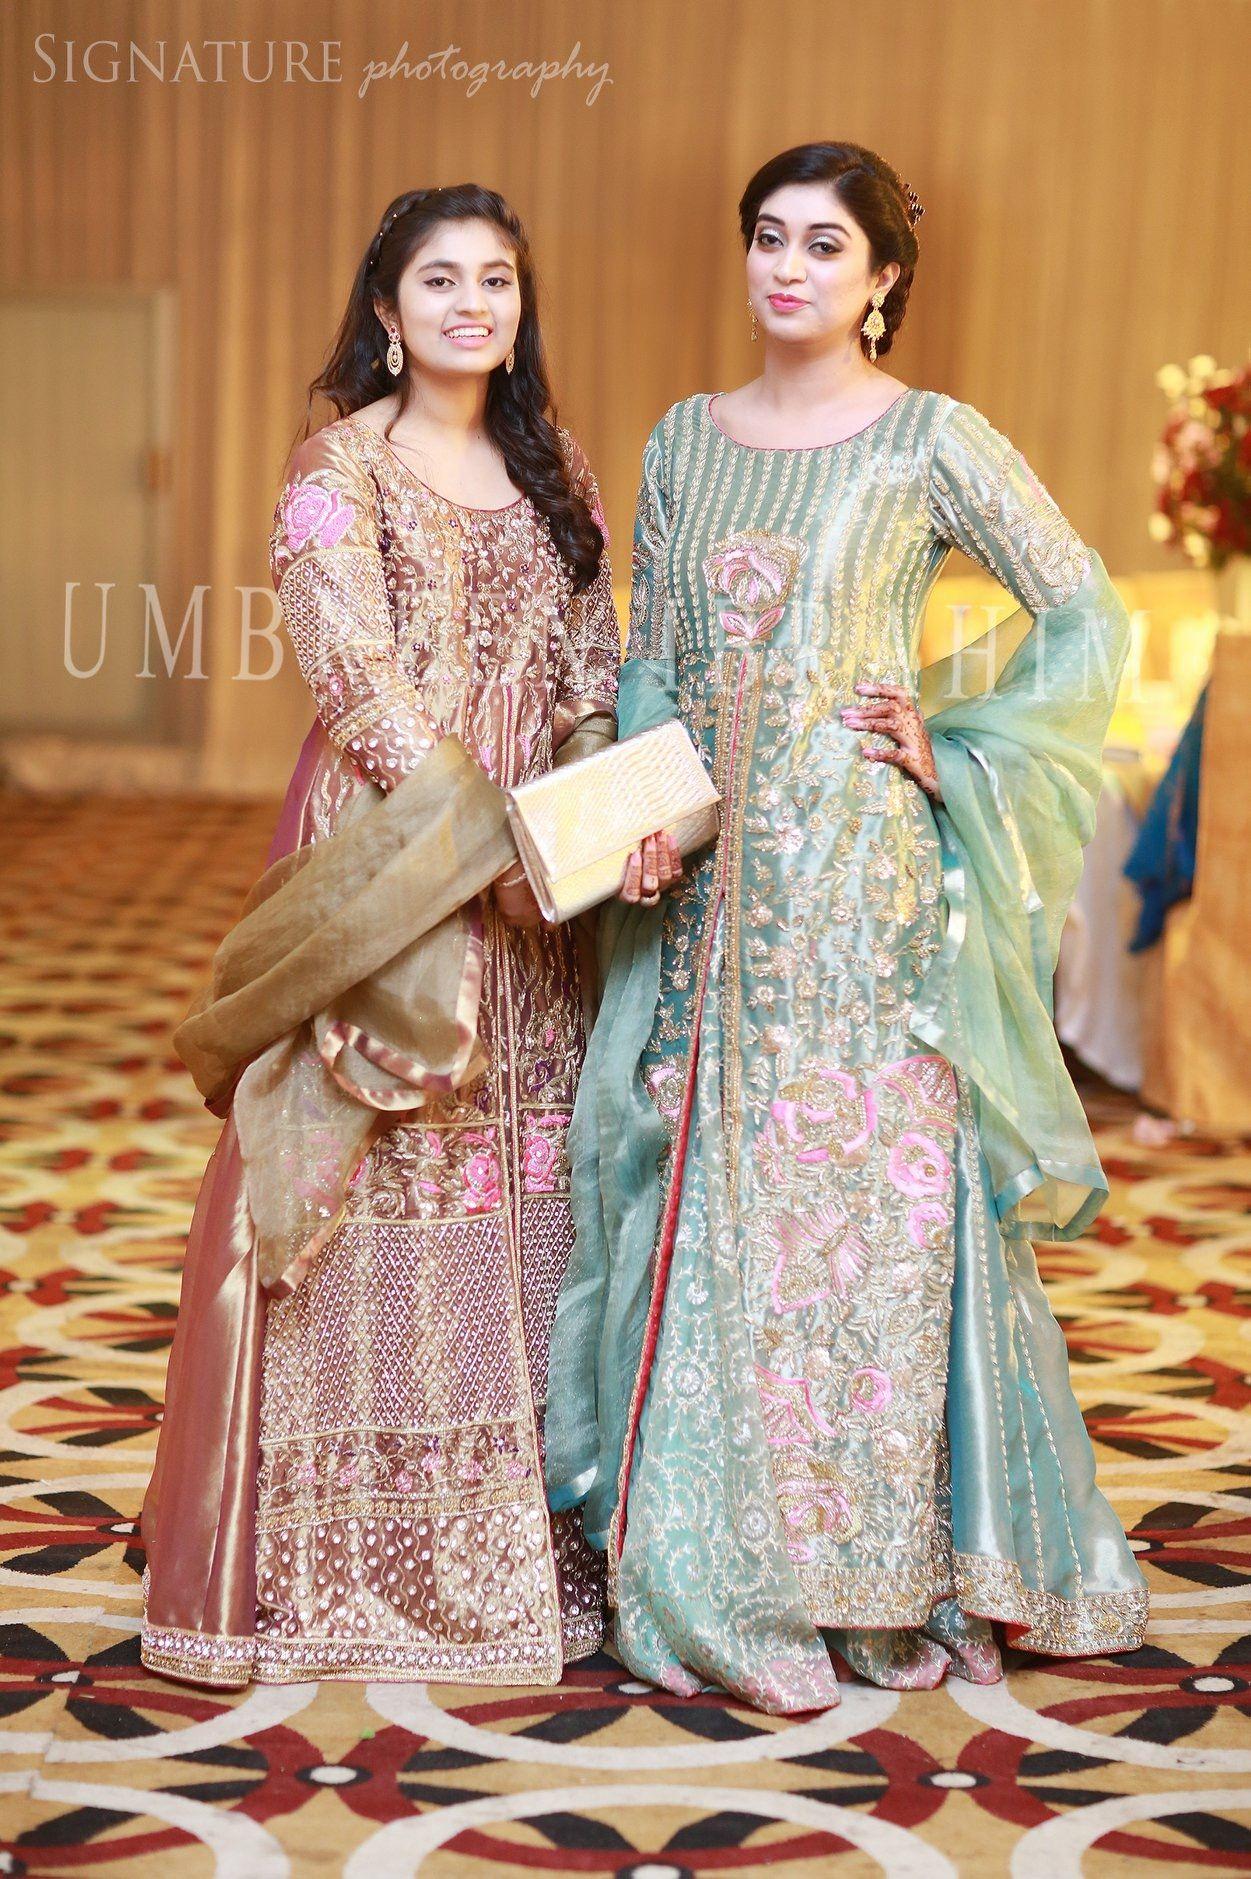 Brides Sisters At The Barat Pakistani Bridal Dresses Pakistani Wedding Outfits Pakistani Outfits